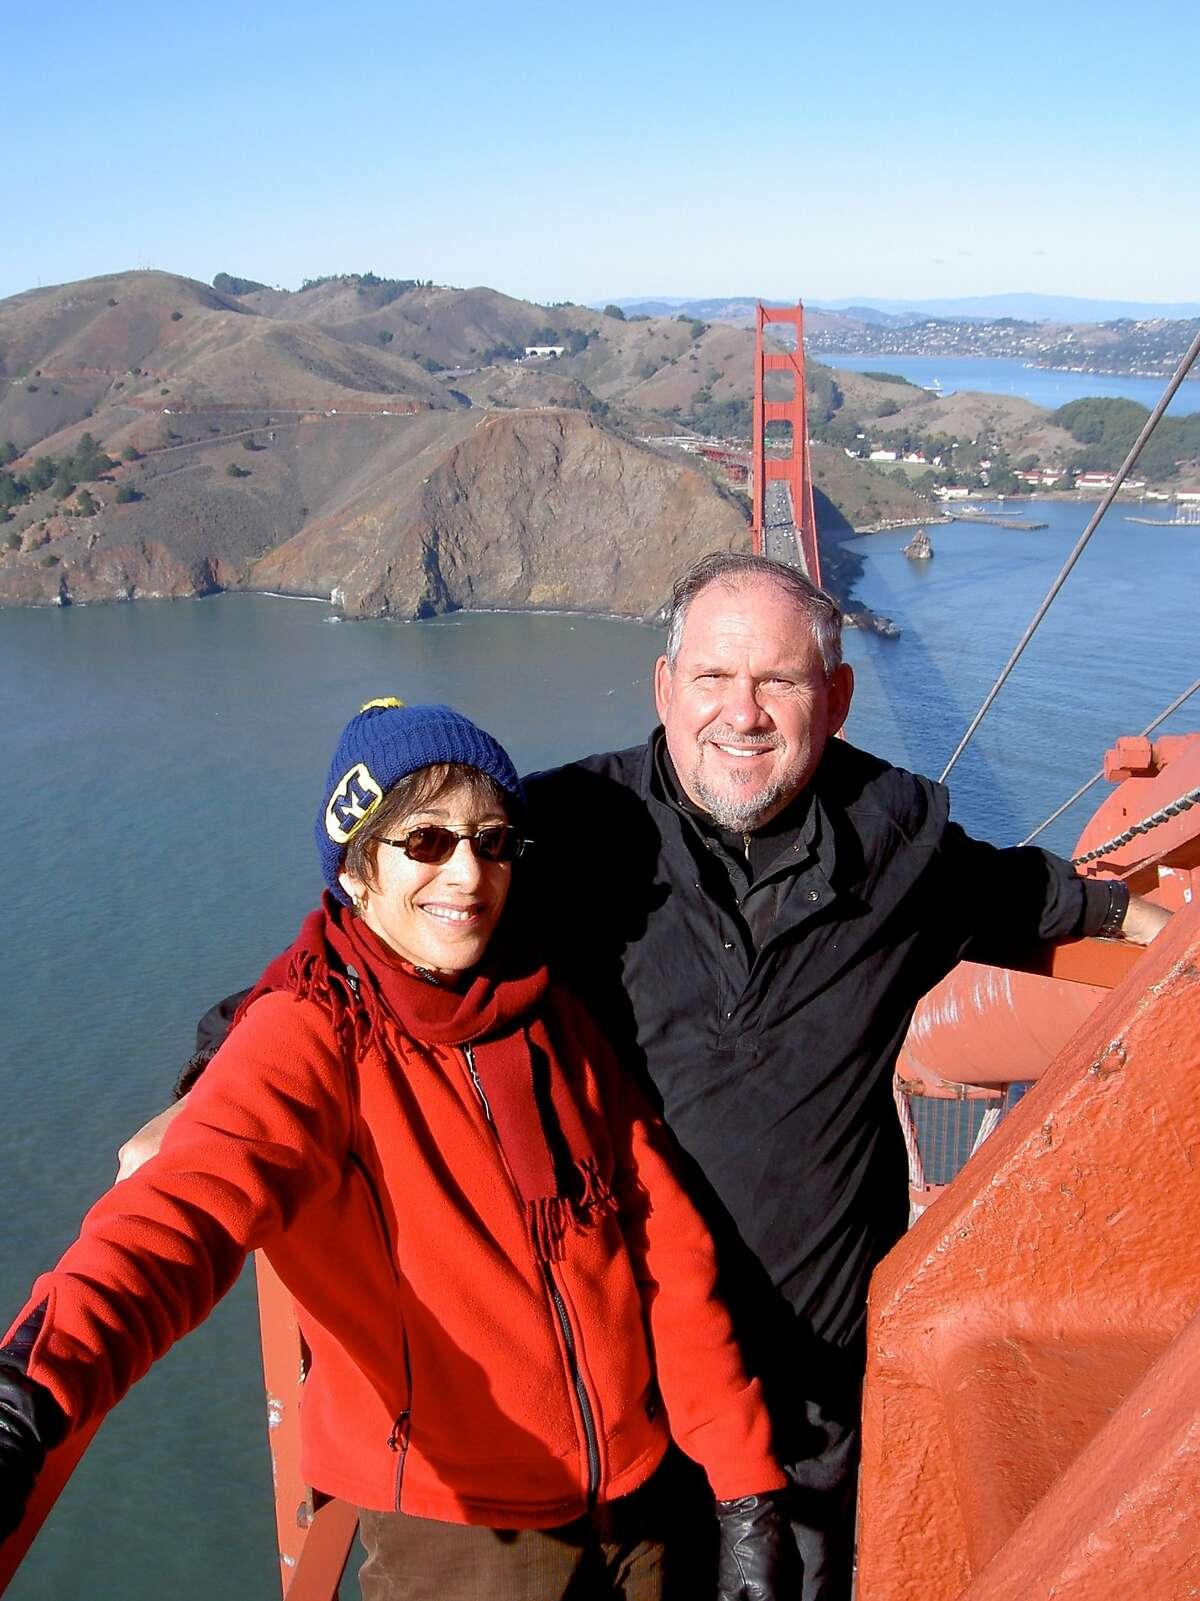 Epidemiologist Larry Brilliant and his wife Girija Brilliant on the Golden Gate Bridge.